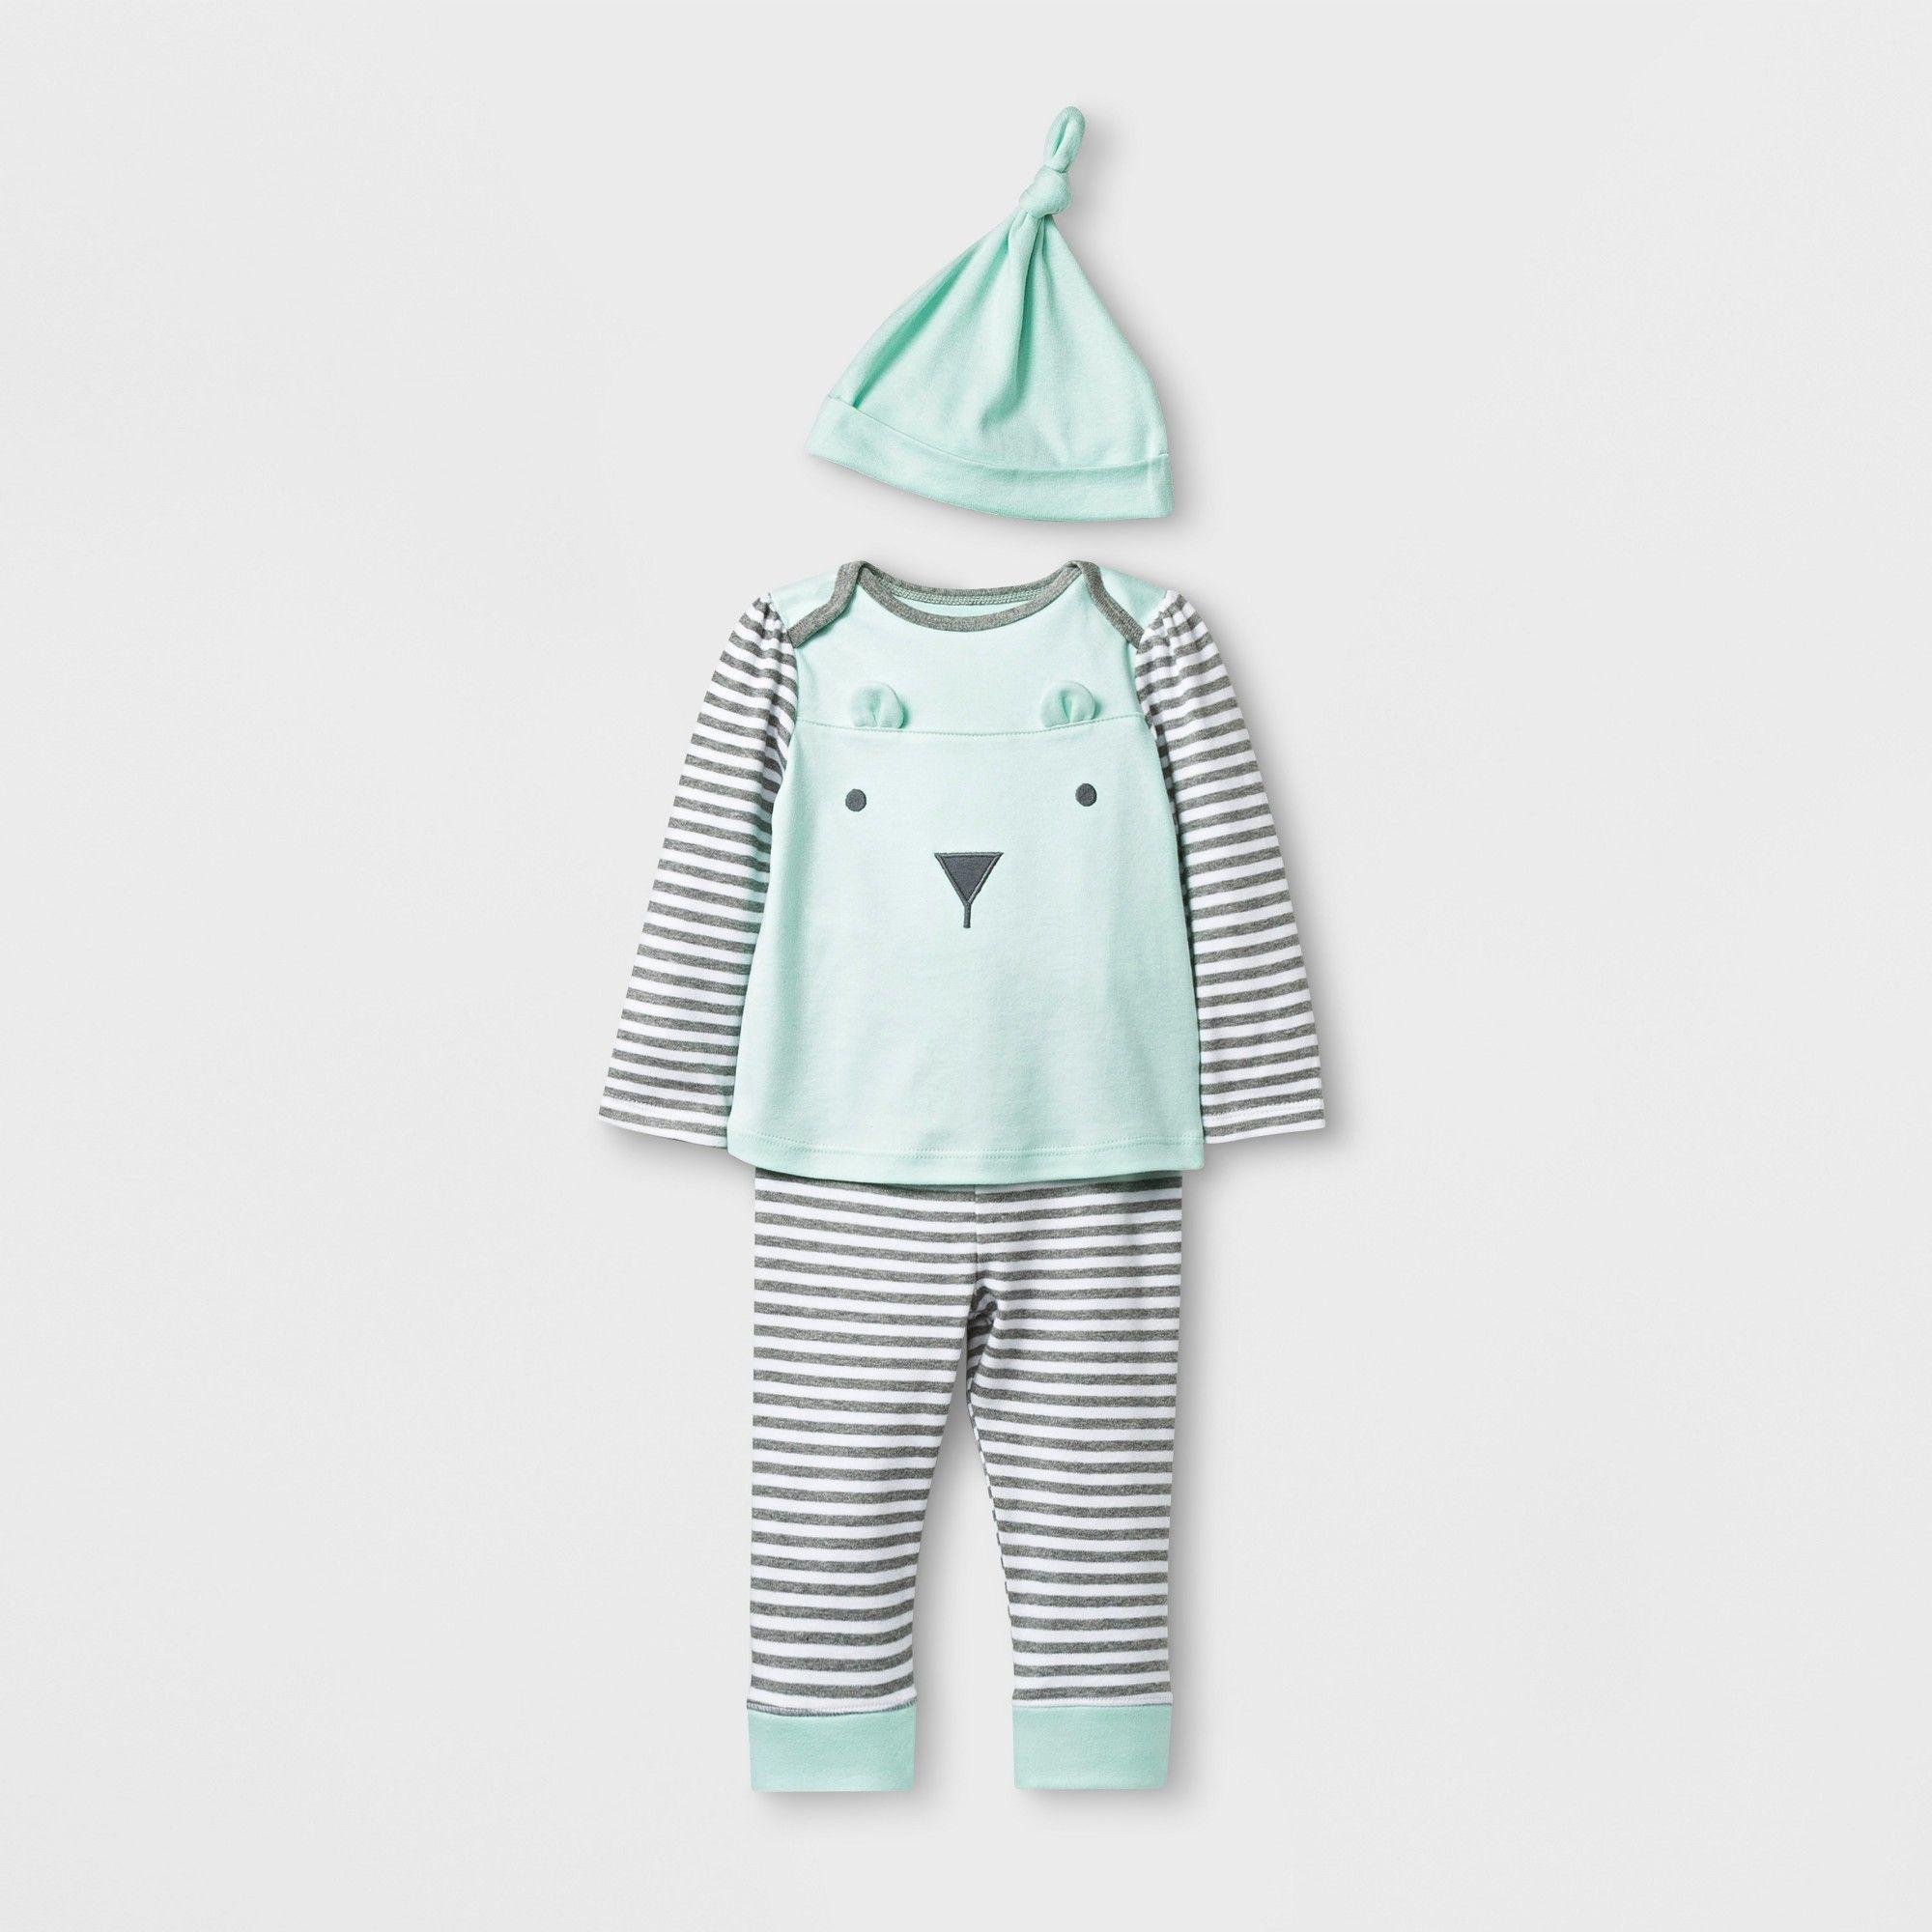 Baby 3pk Pants Cloud Island Mint//Gray//Striped 12M NEW